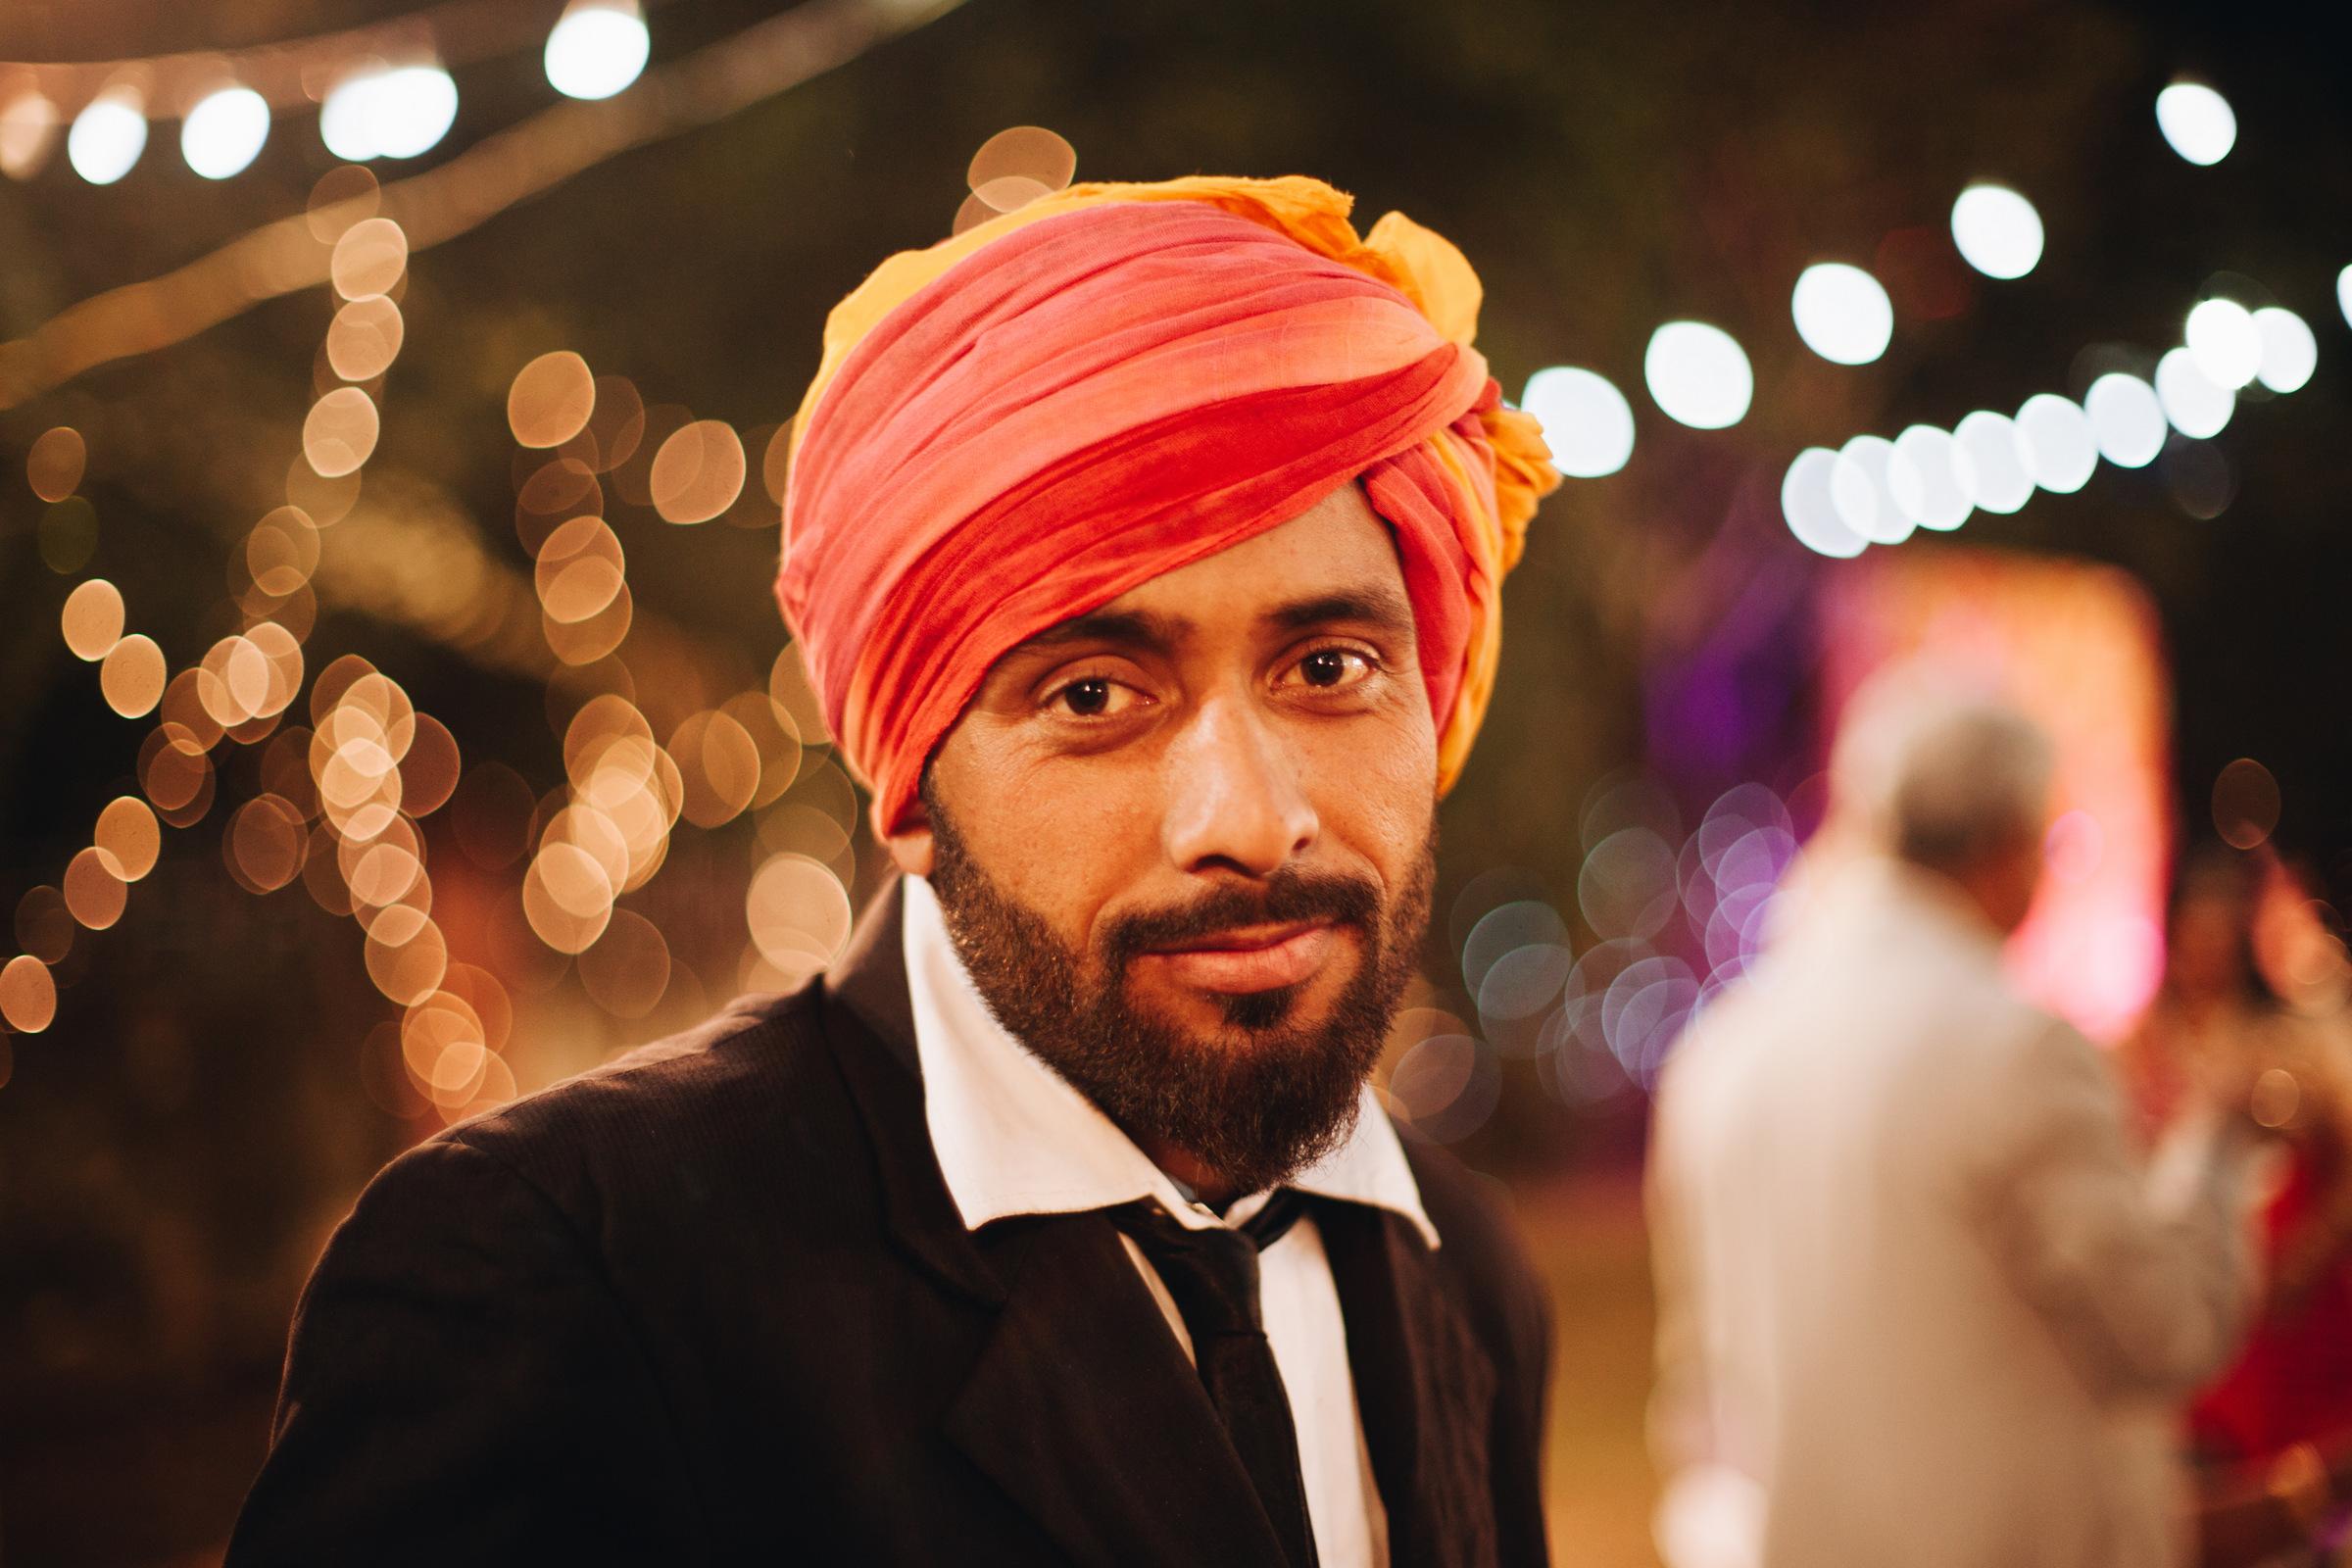 wesele w indiach